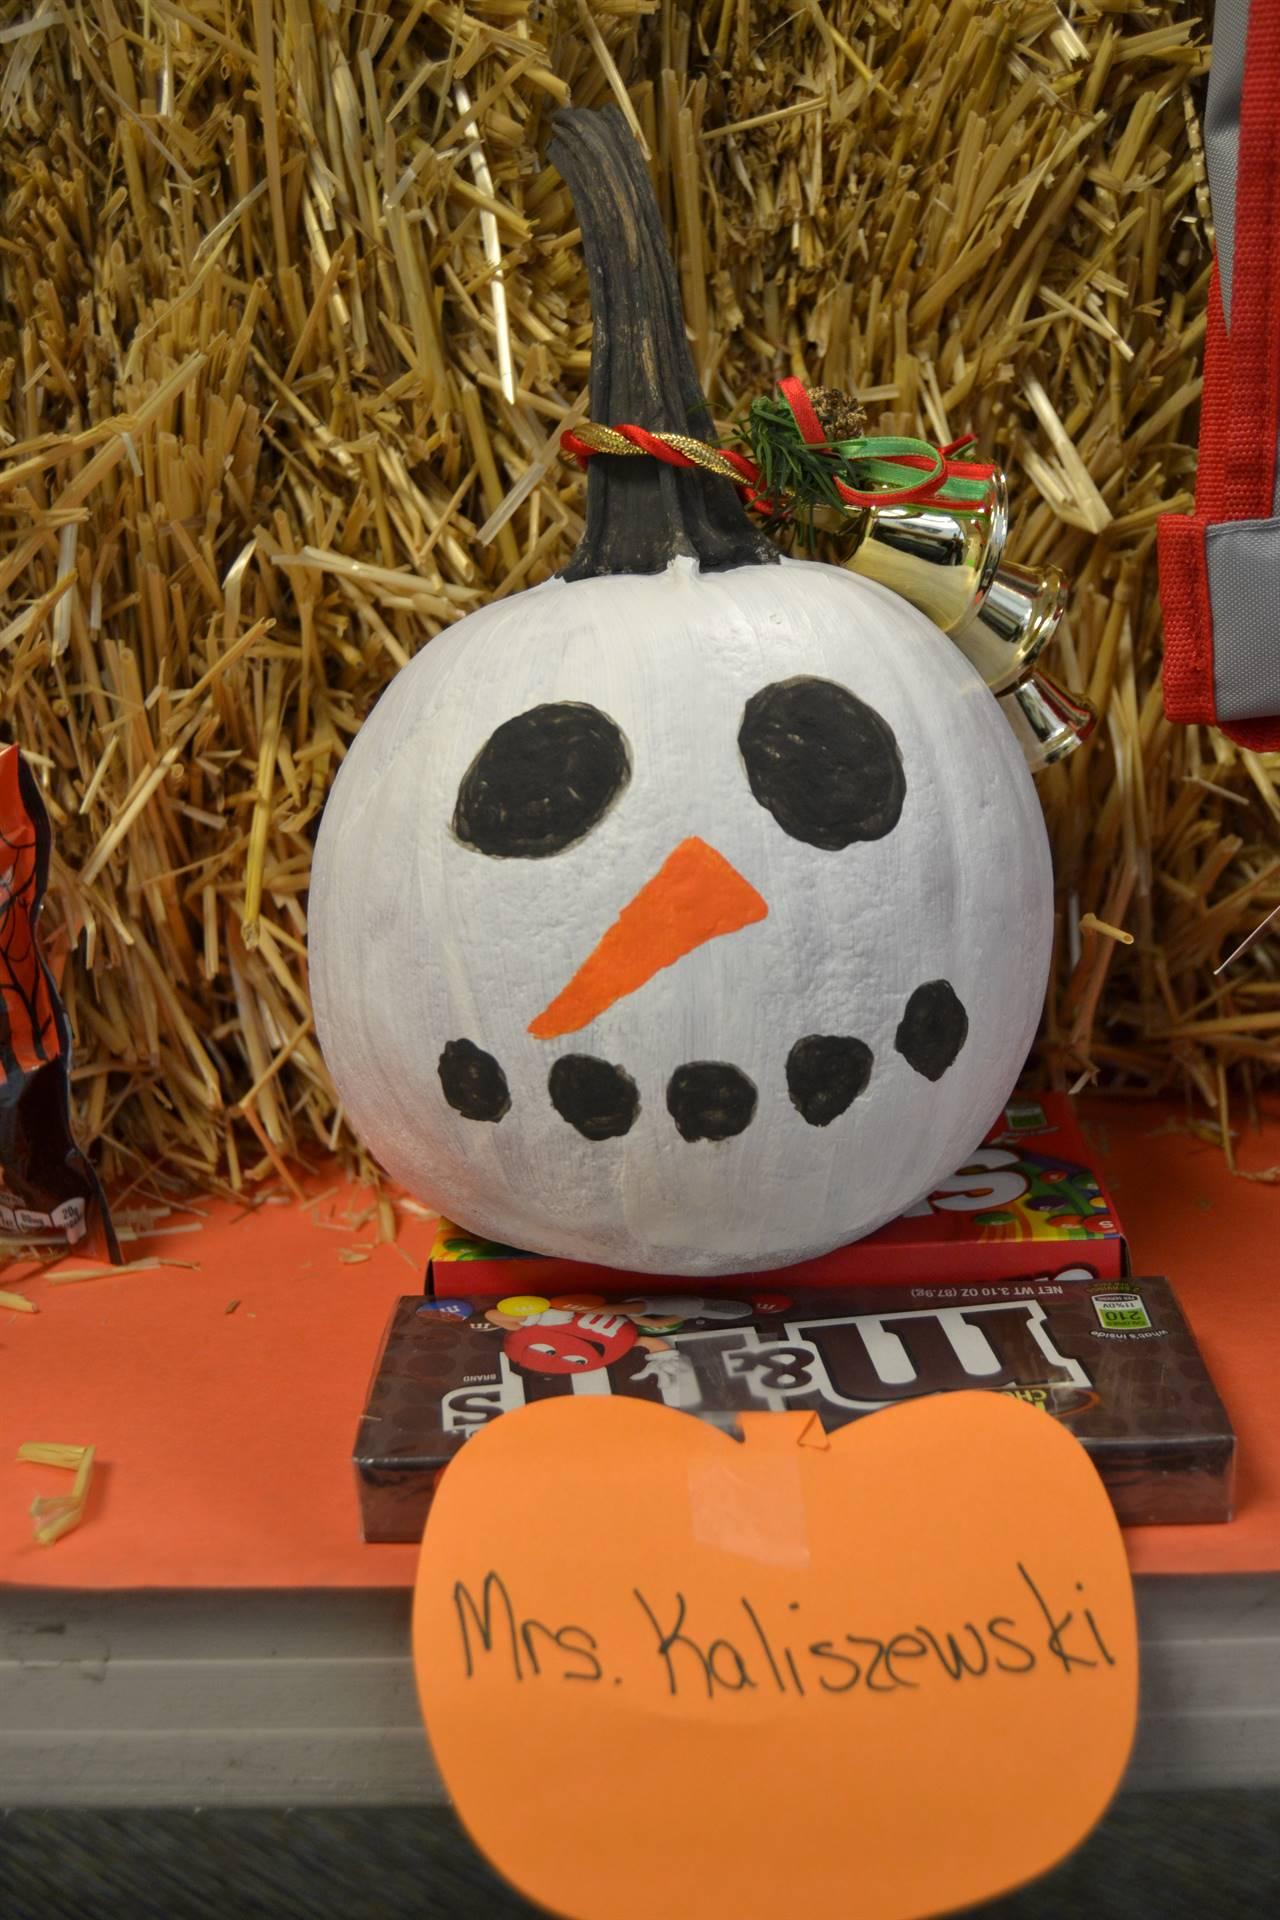 Pumpkin created by Mrs. Kaliszewski